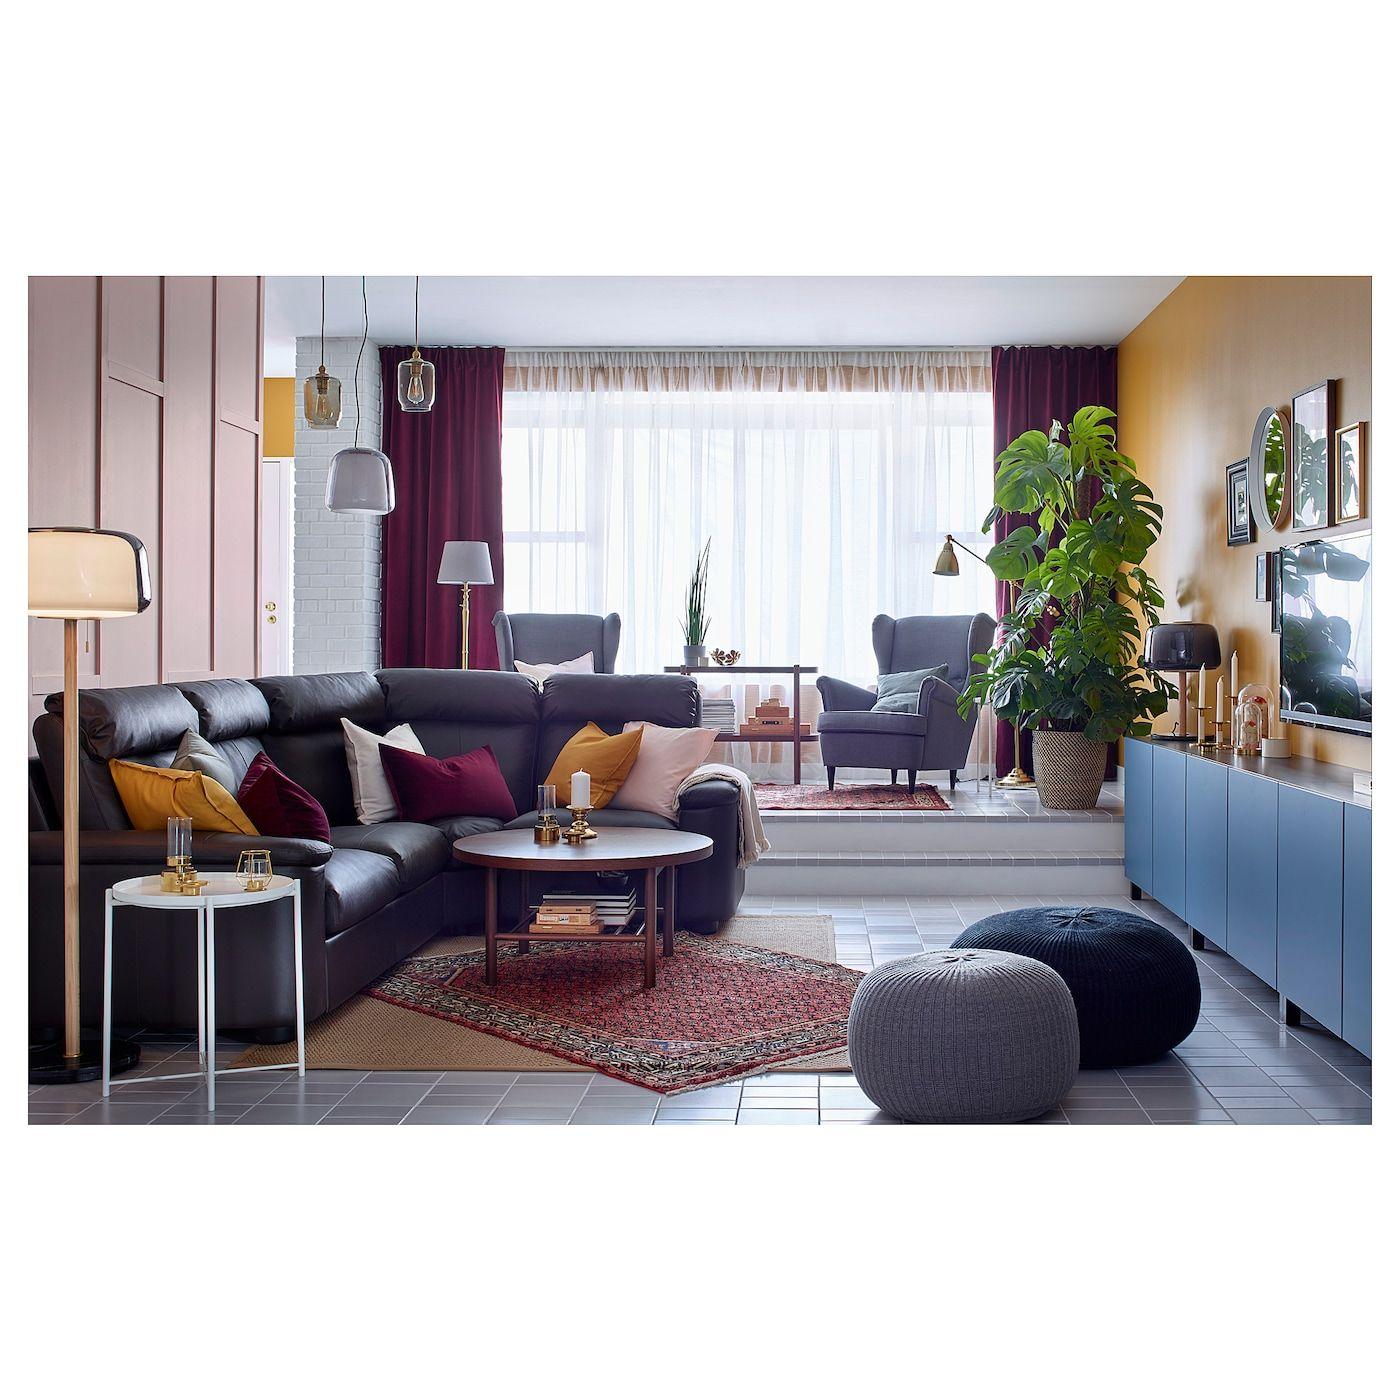 Lidhult Sectional 4 Seat Corner Grann Bomstad Dark Brown Ikea In 2021 Living Room Furniture Inspiration Living Room Designs Living Room Inspiration [ 1400 x 1400 Pixel ]